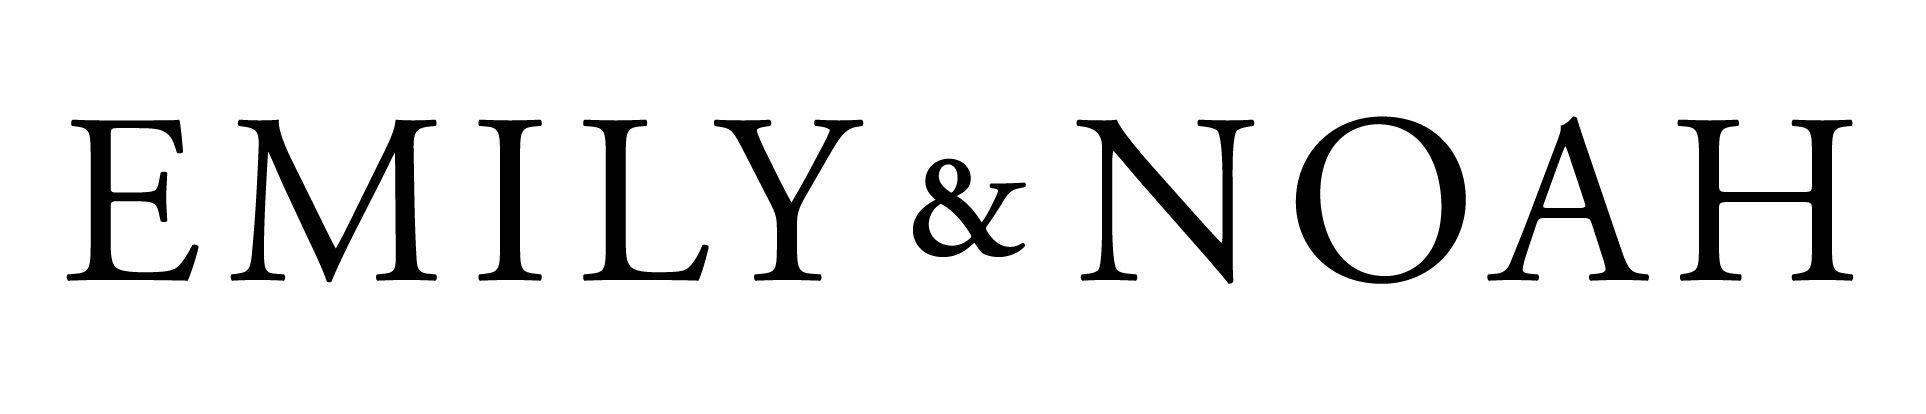 Emily & Noah logo